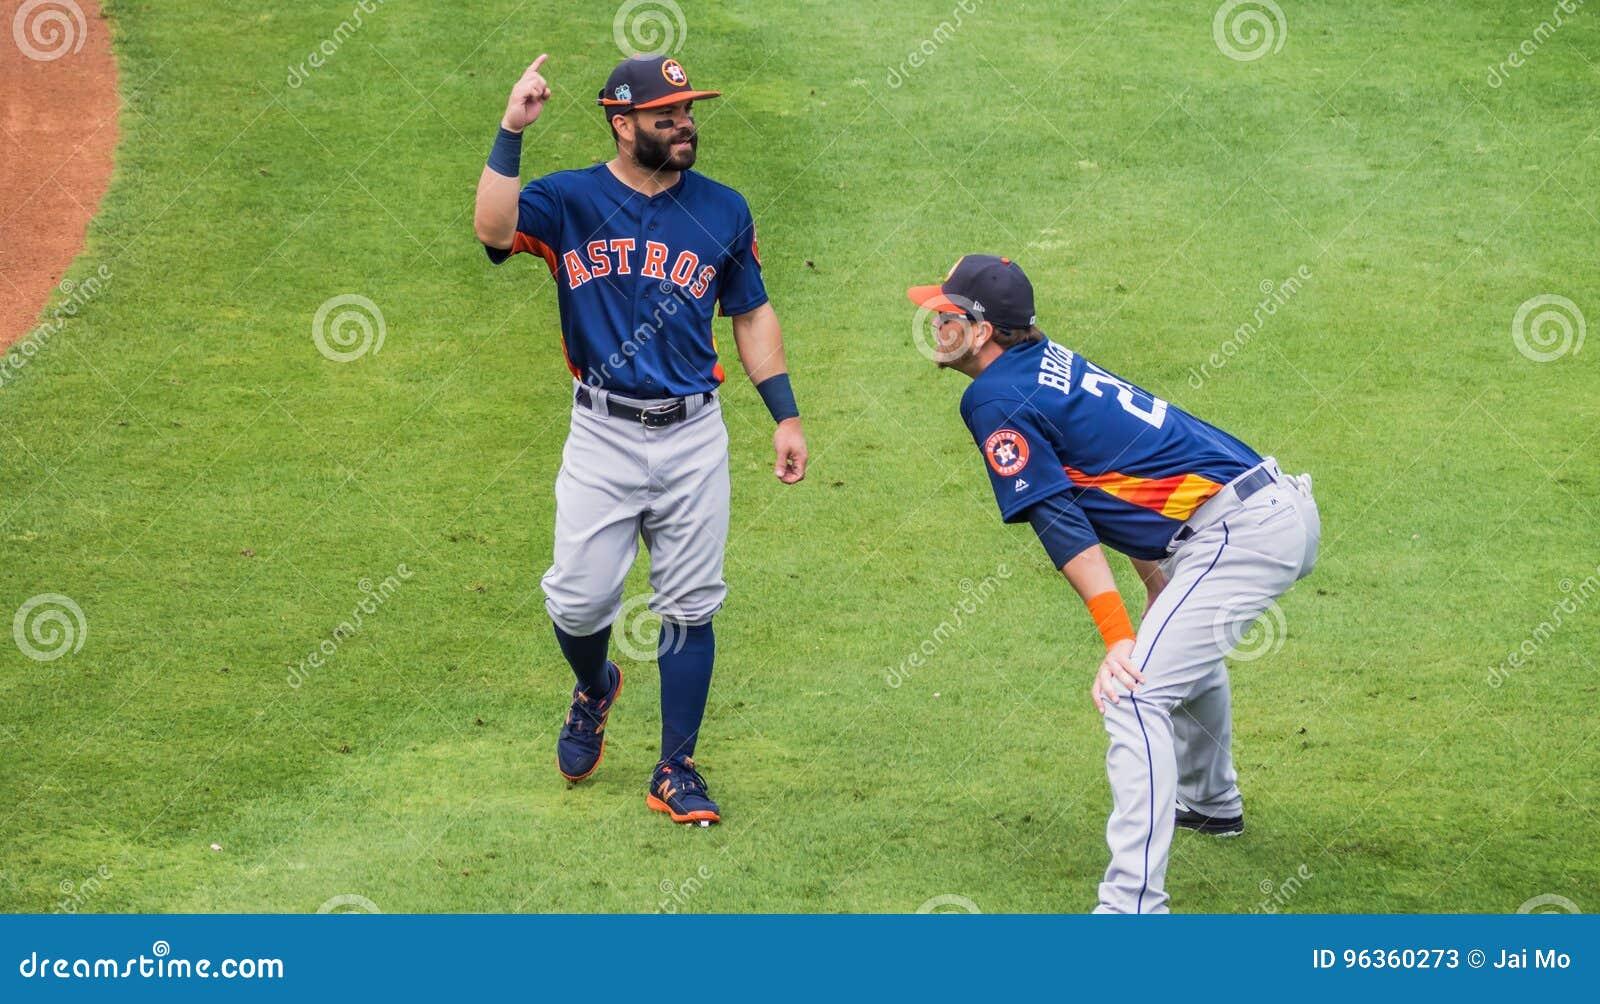 Jose Altuve Reid Brignac Houston Astros 2017